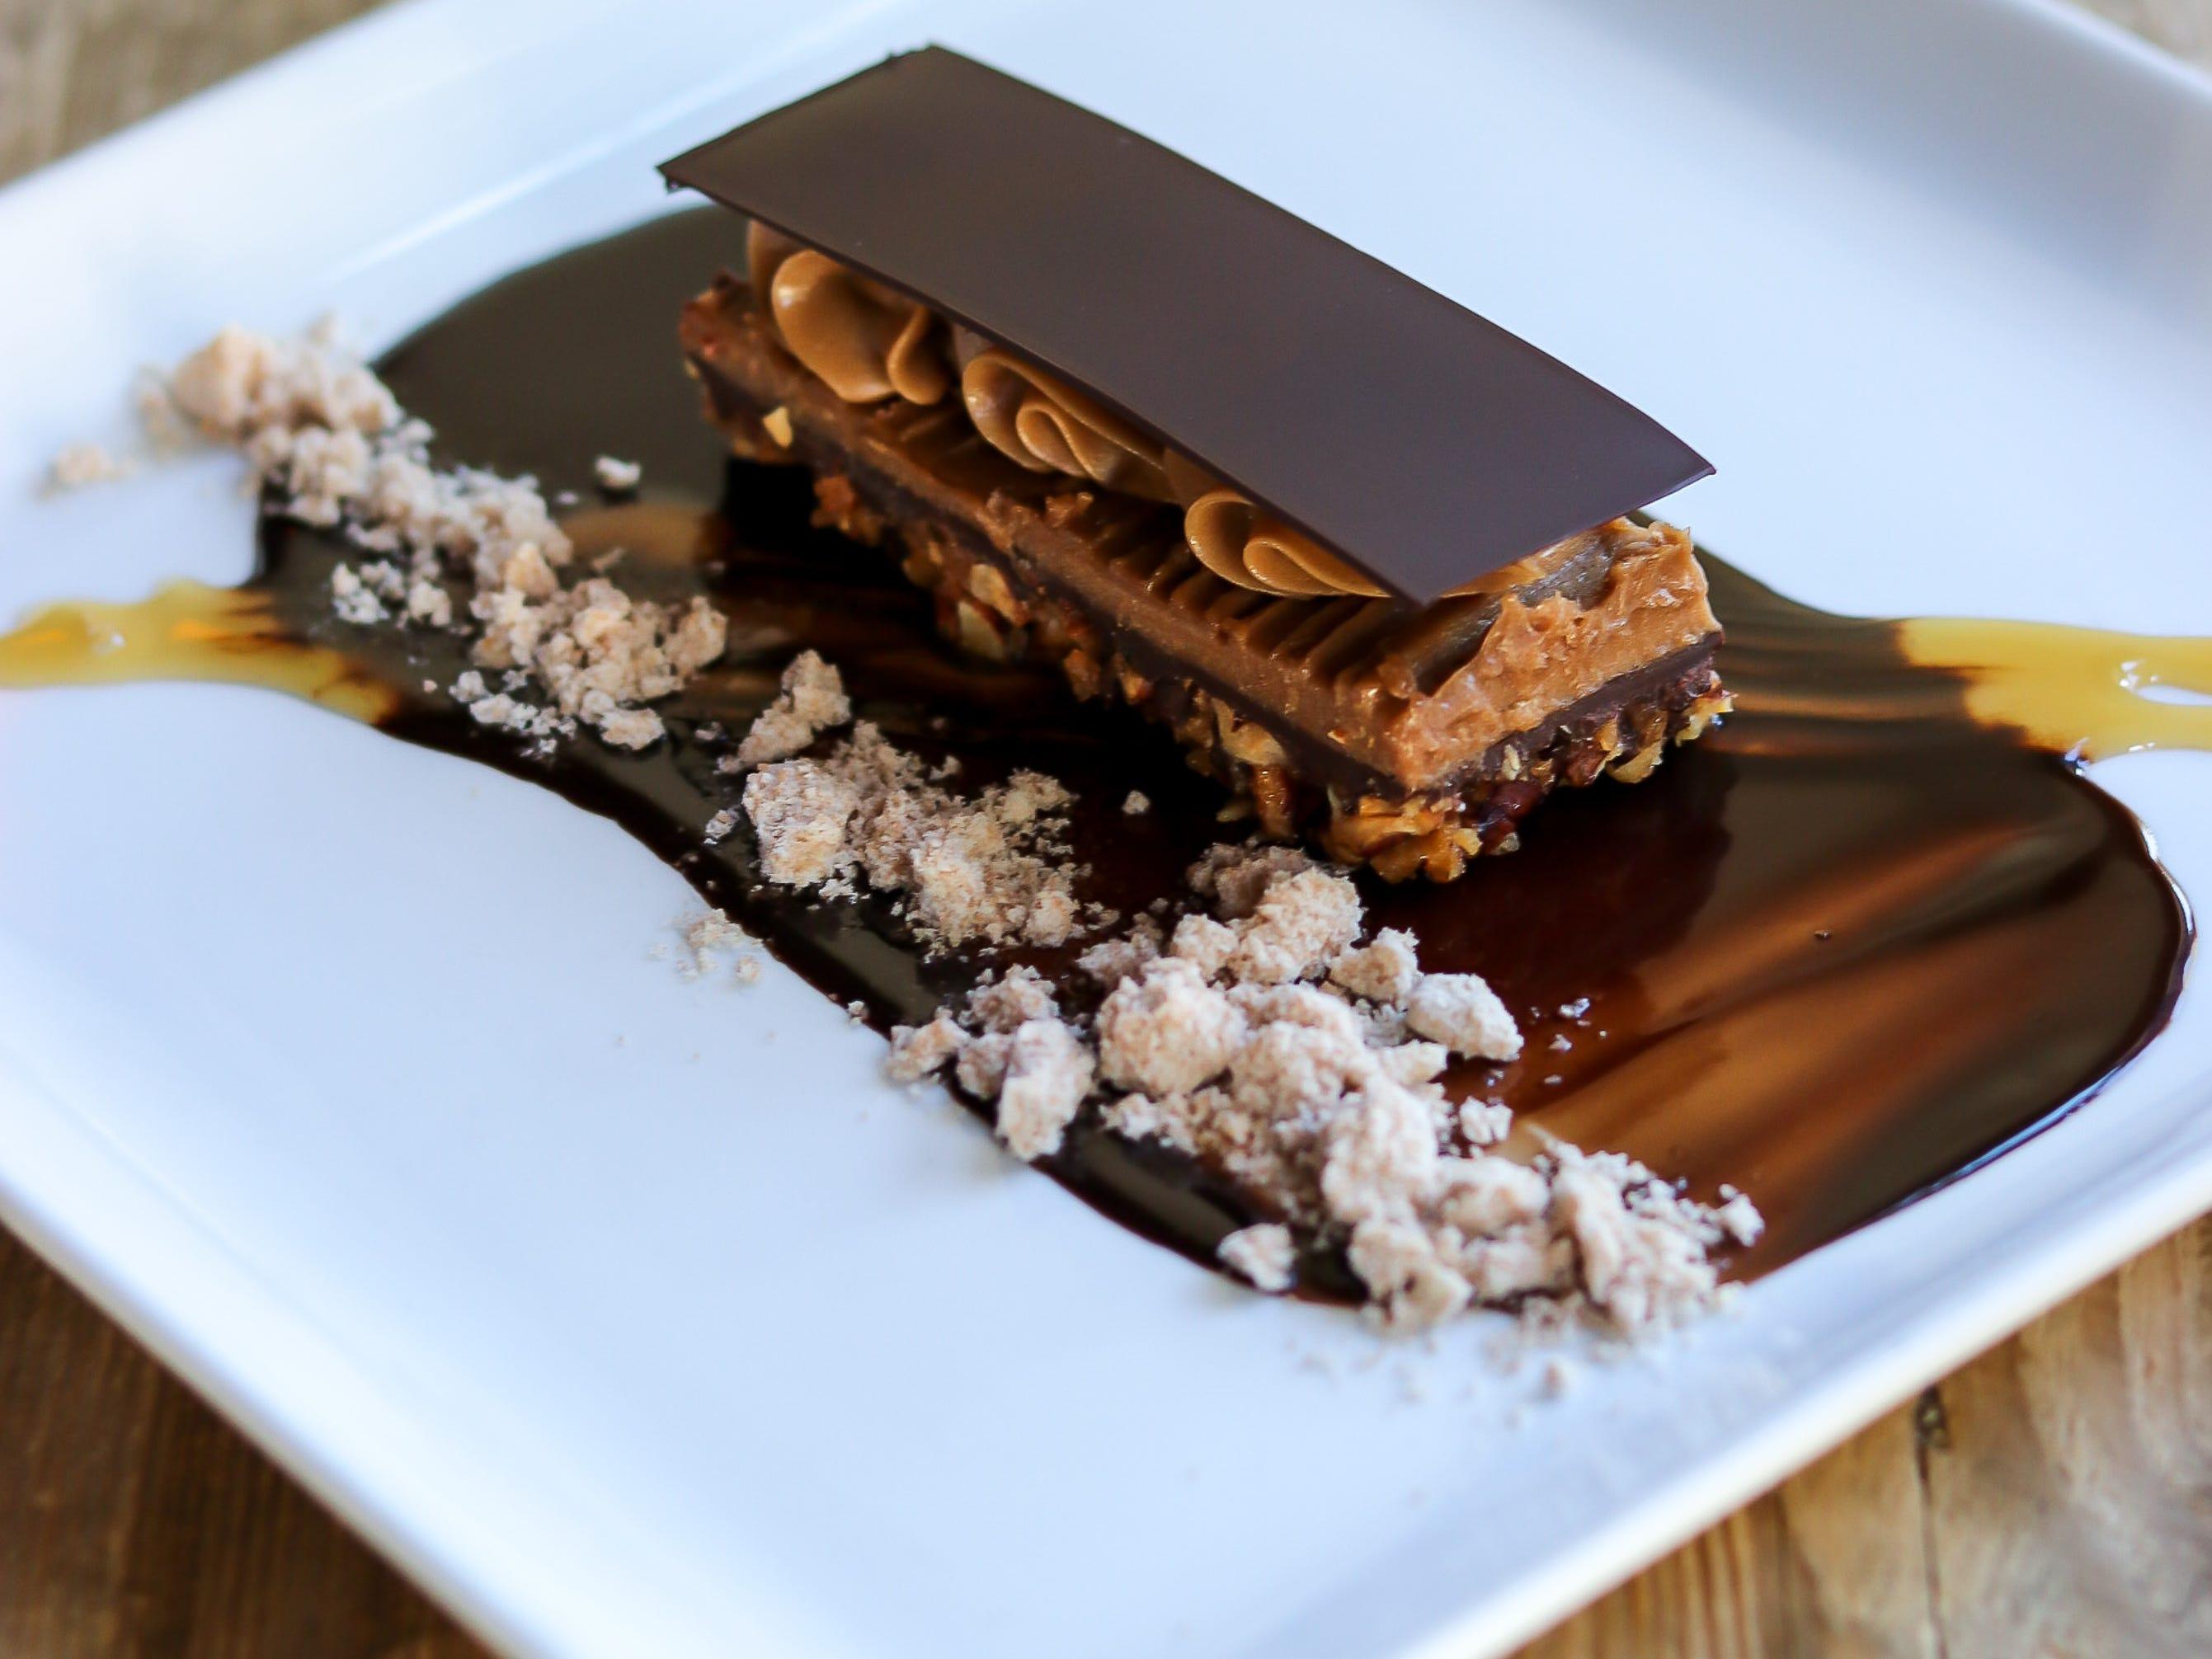 The dark chocolate truffle torte at Litchfield's.